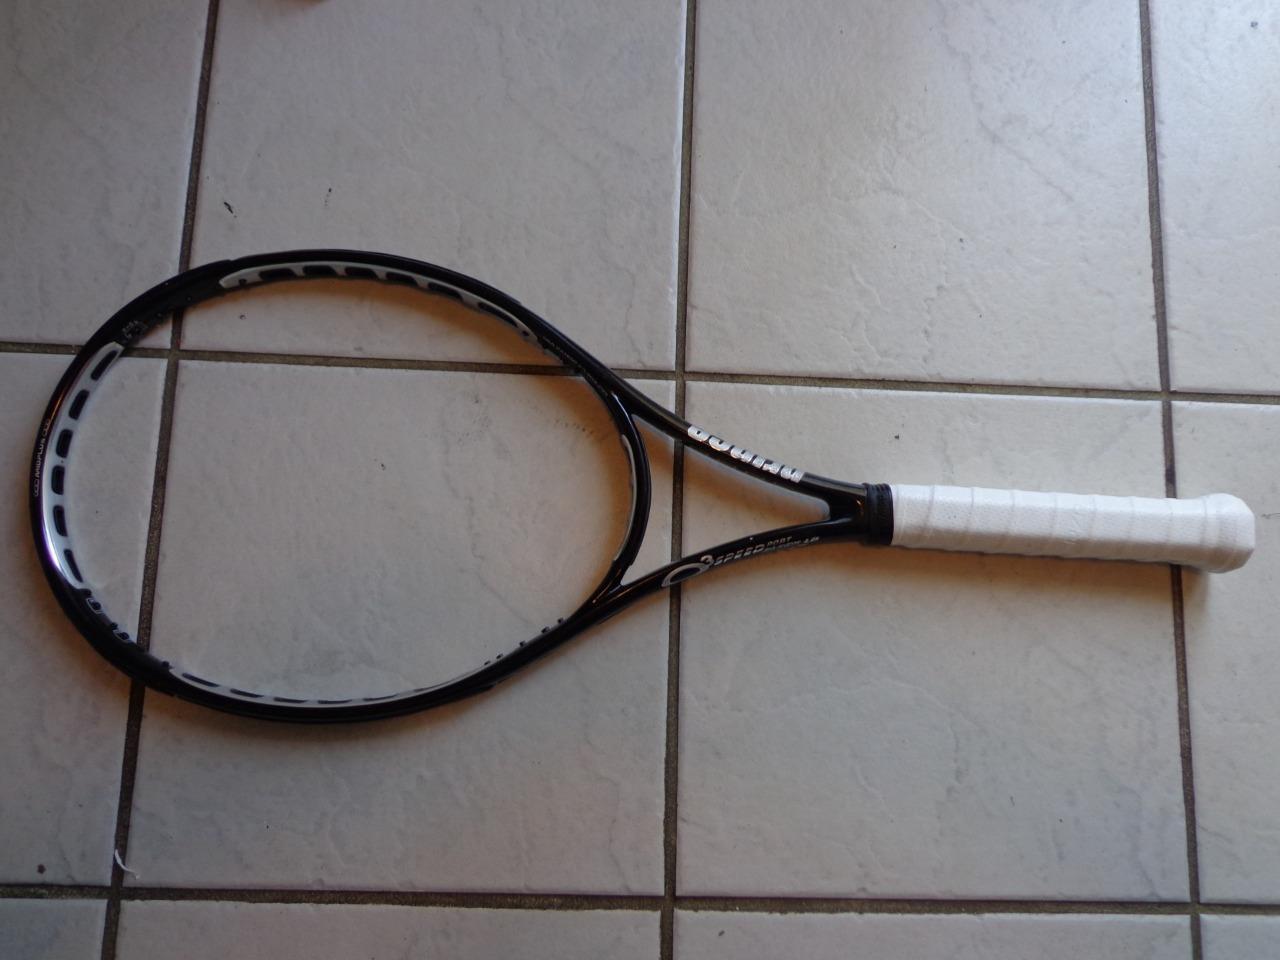 Prince O3 Speedport Negro longbody 27.5 pulgadas 100 cabeza 4 4 4 3 8 Grip Tenis Raqueta 786095